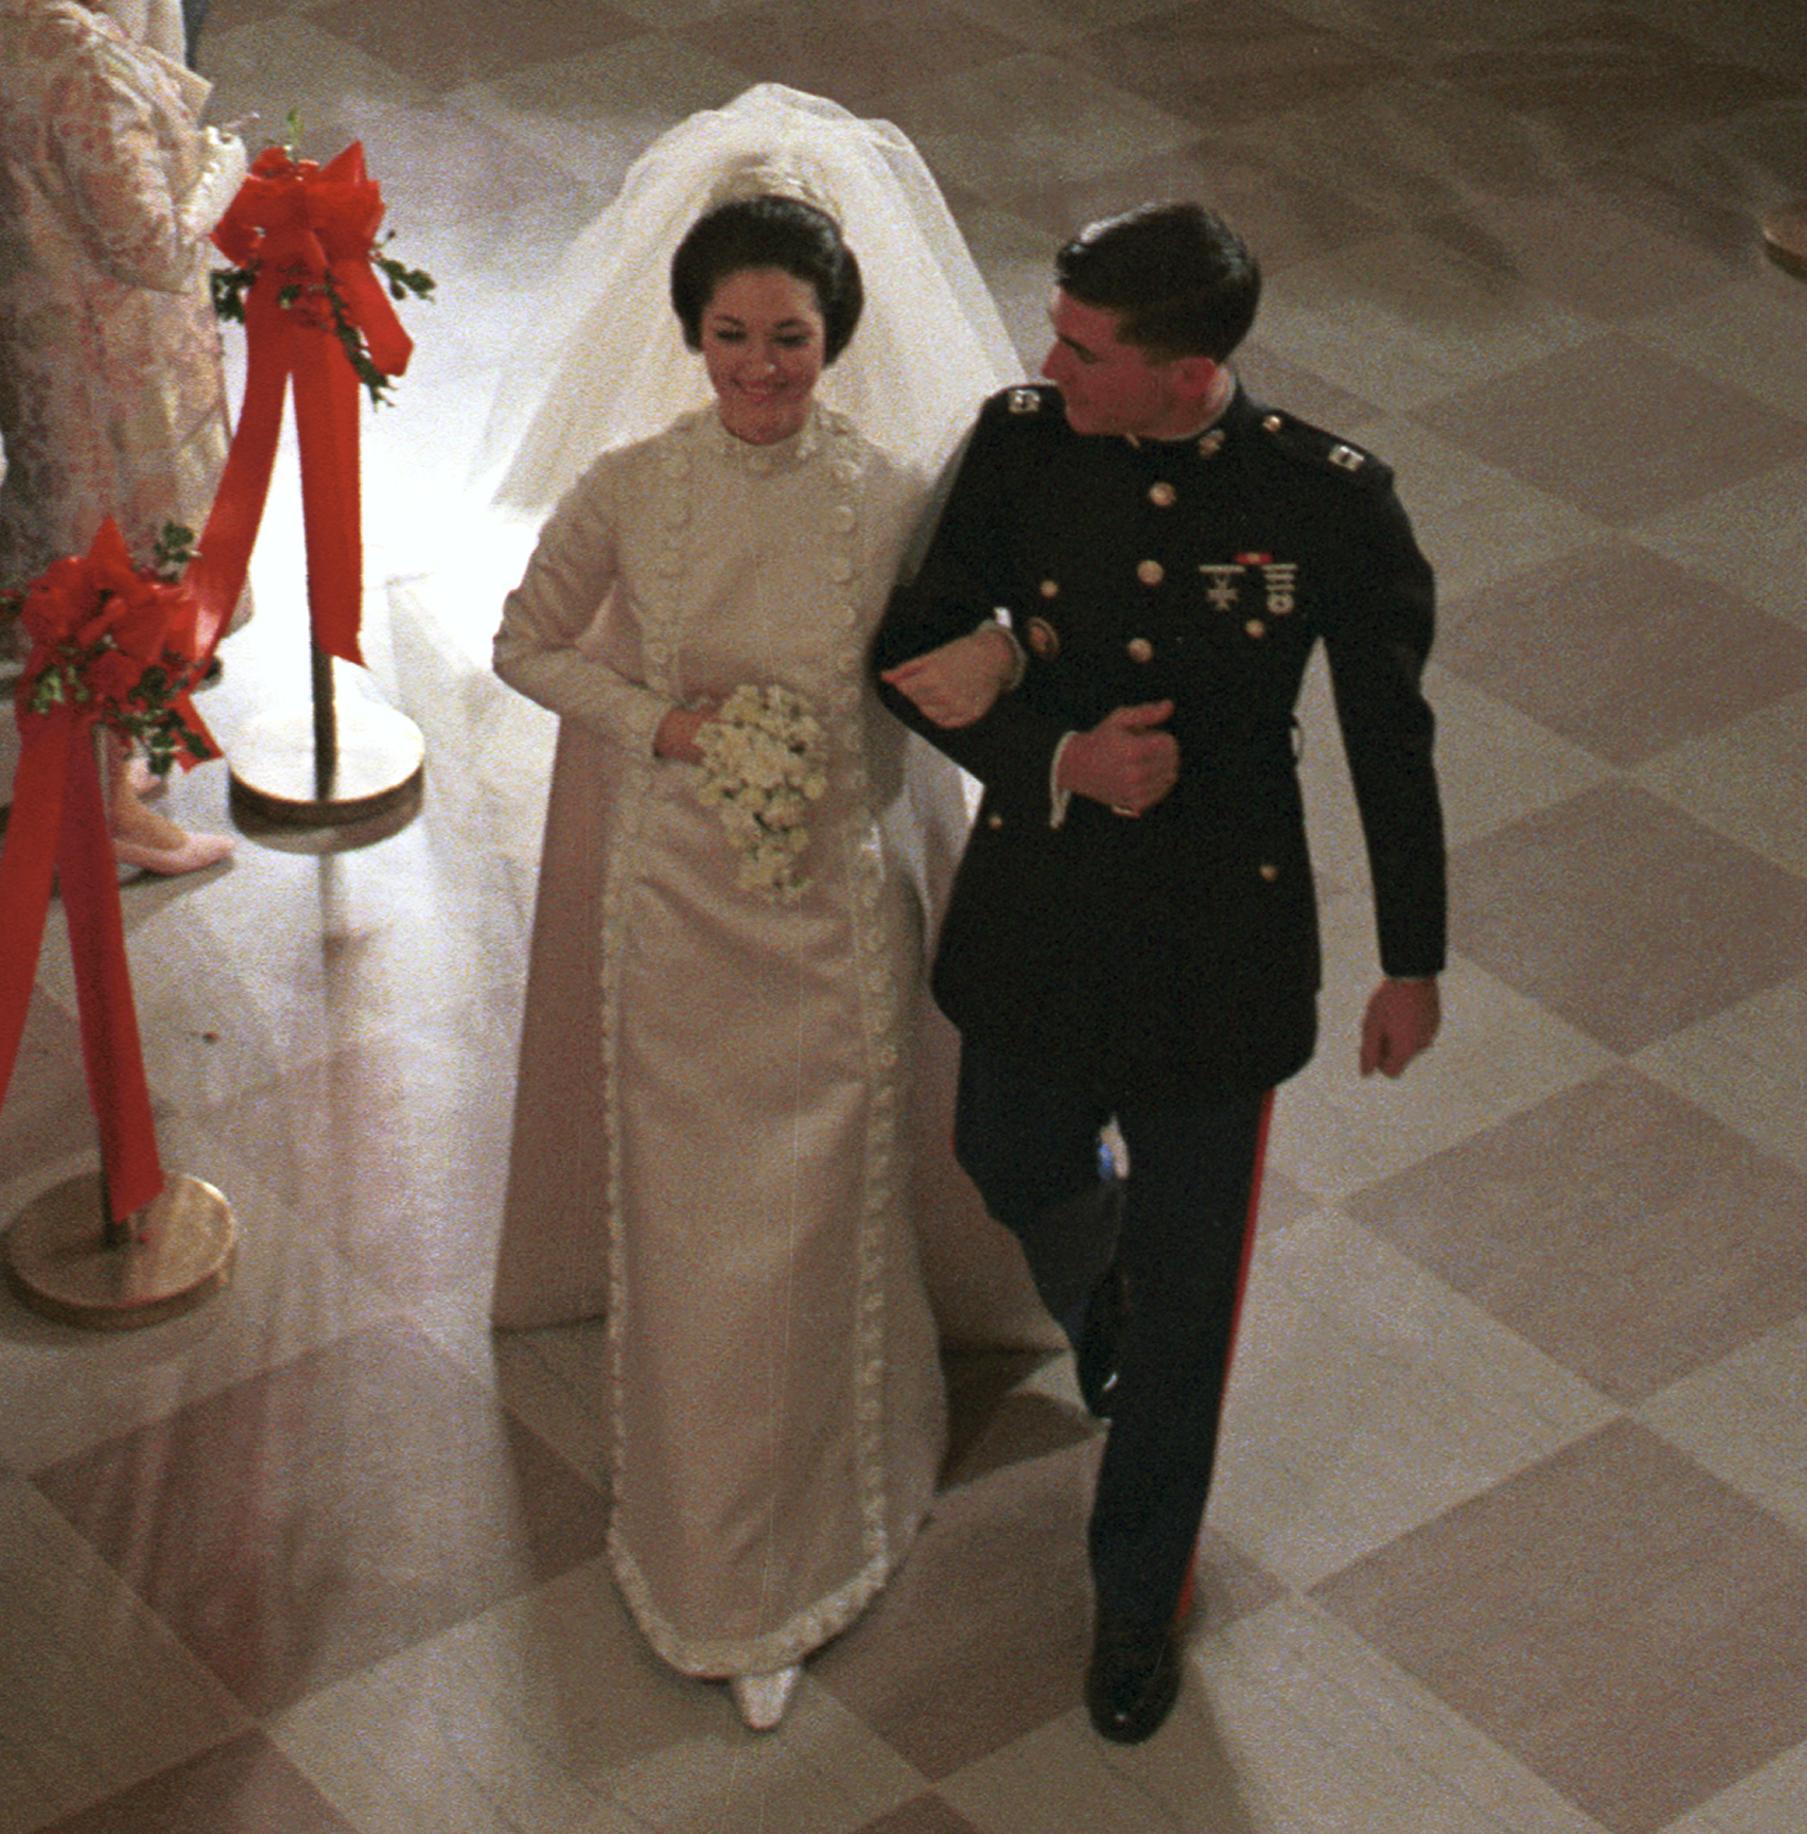 filelynda bird johnson and charles robb wedding cropped1